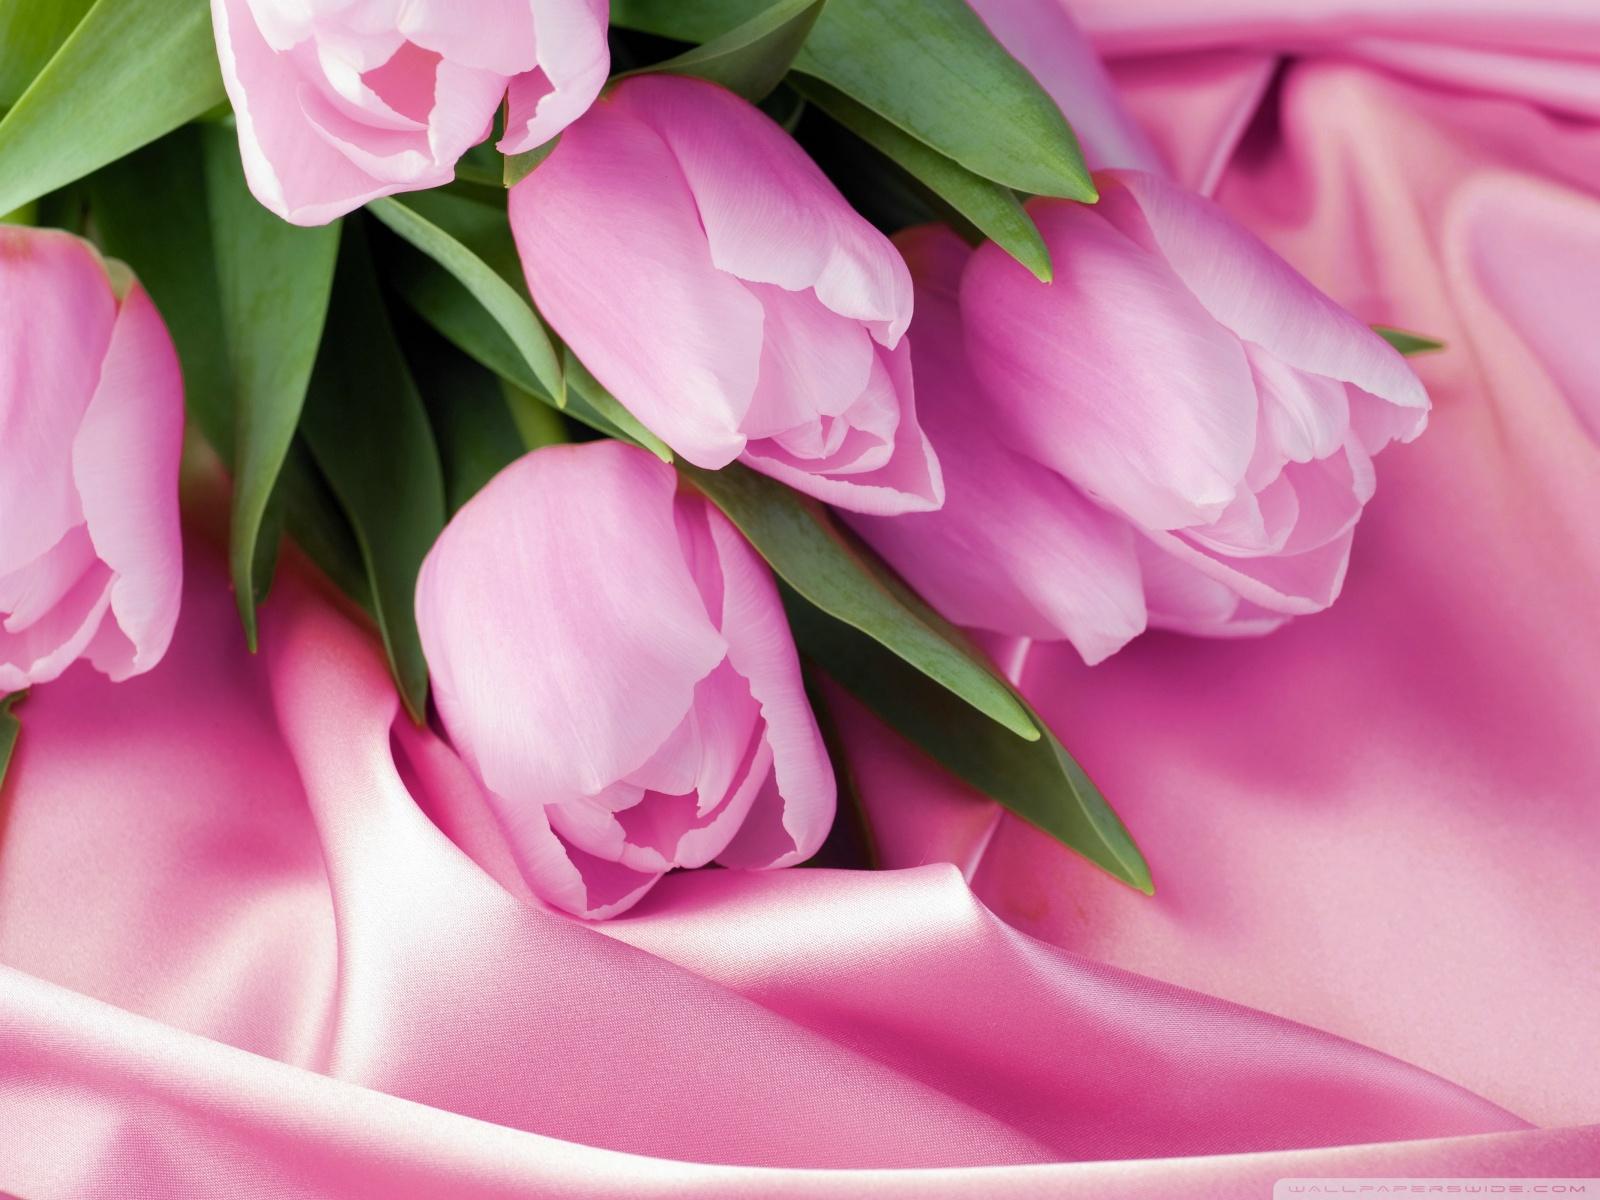 Free Romantic Tulips phone wallpaper by erica67